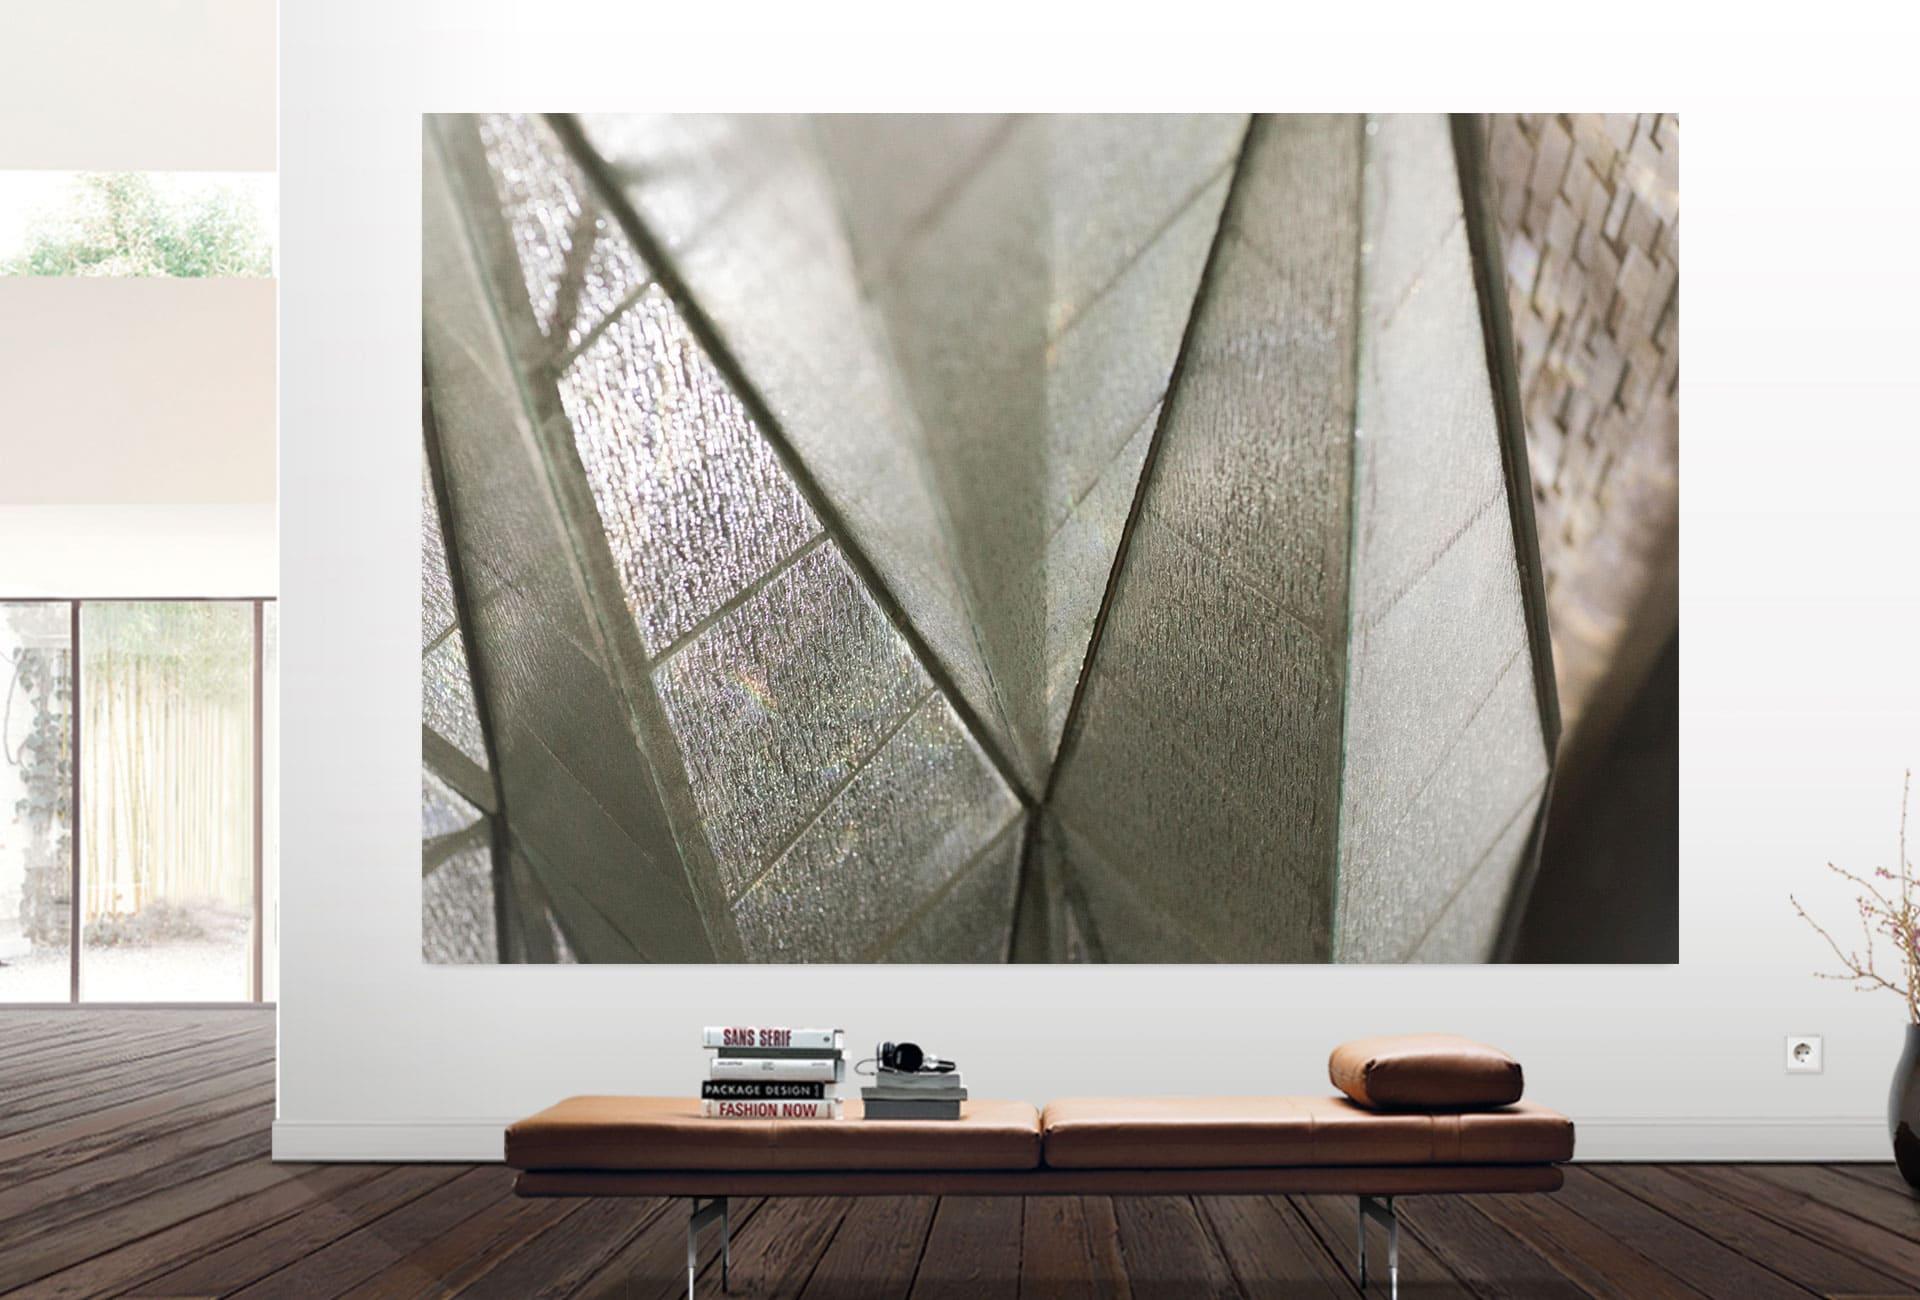 simoarts-com-simone-kessler-fotokunst-nuernberg-cayman-island-Motiv04-1